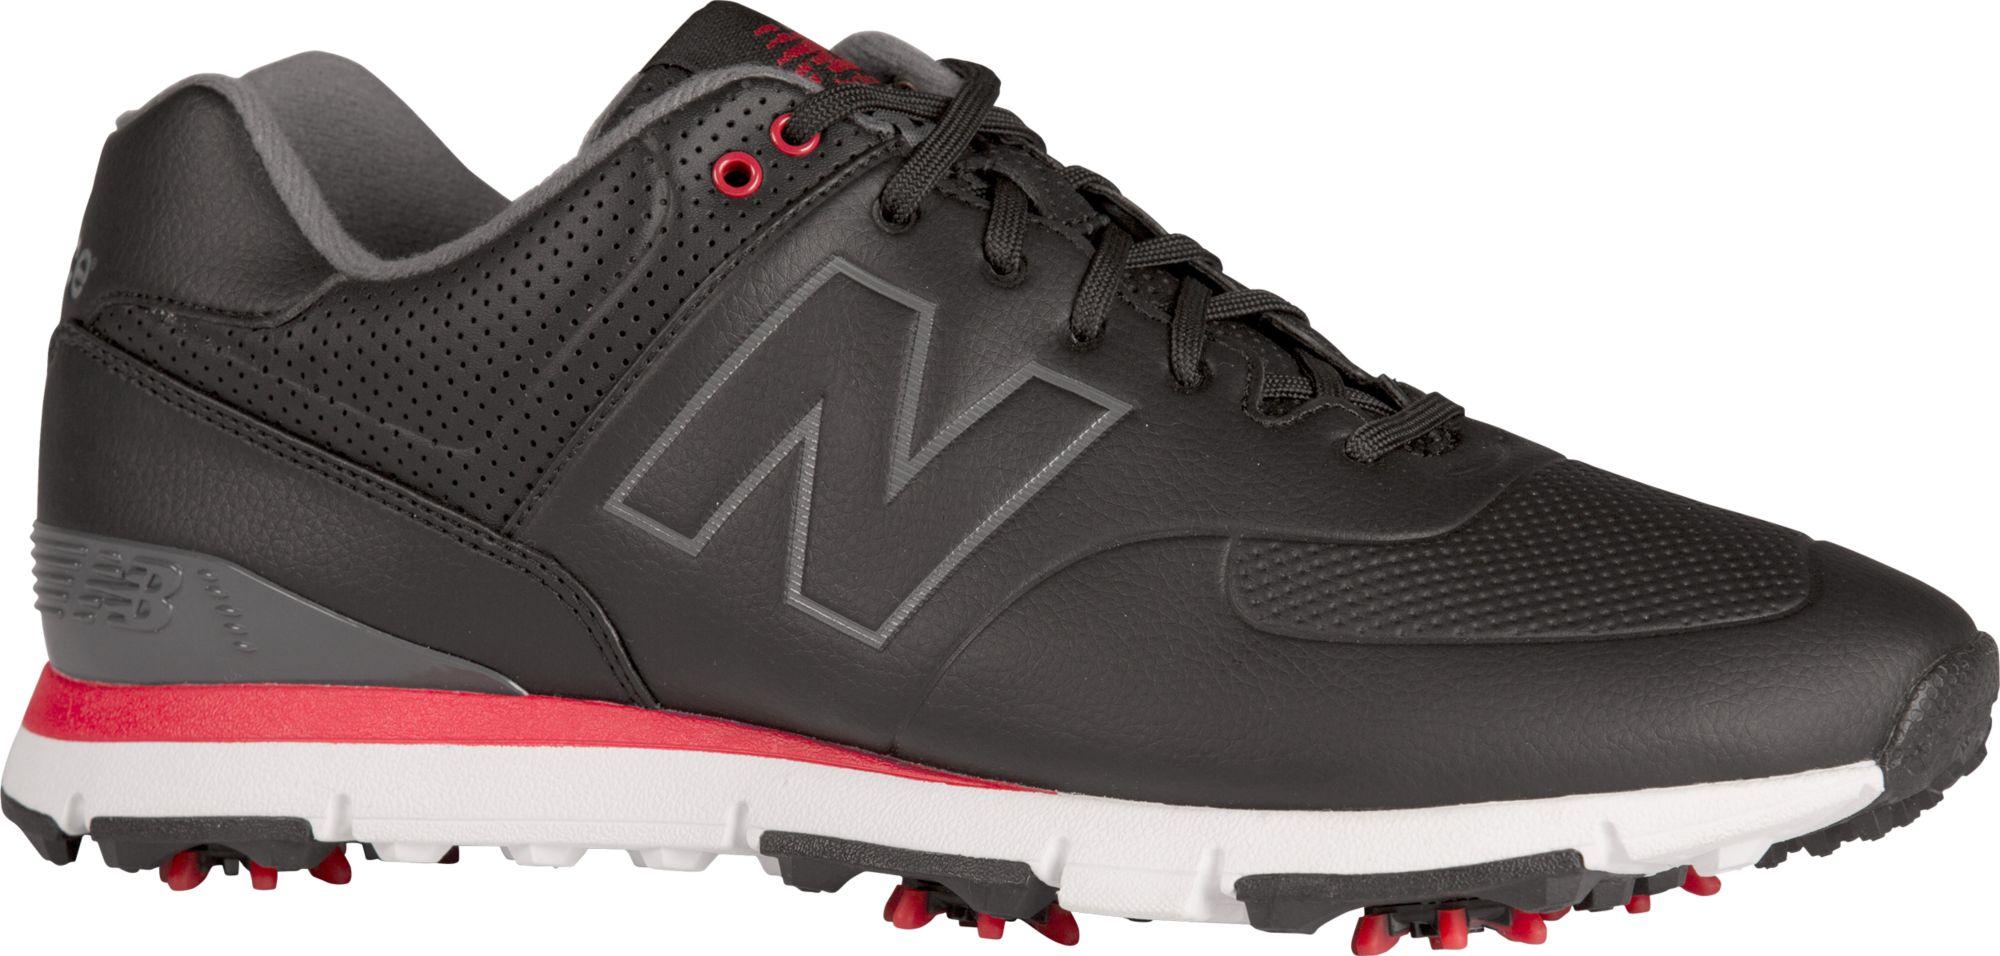 new balance 574 golf shoes